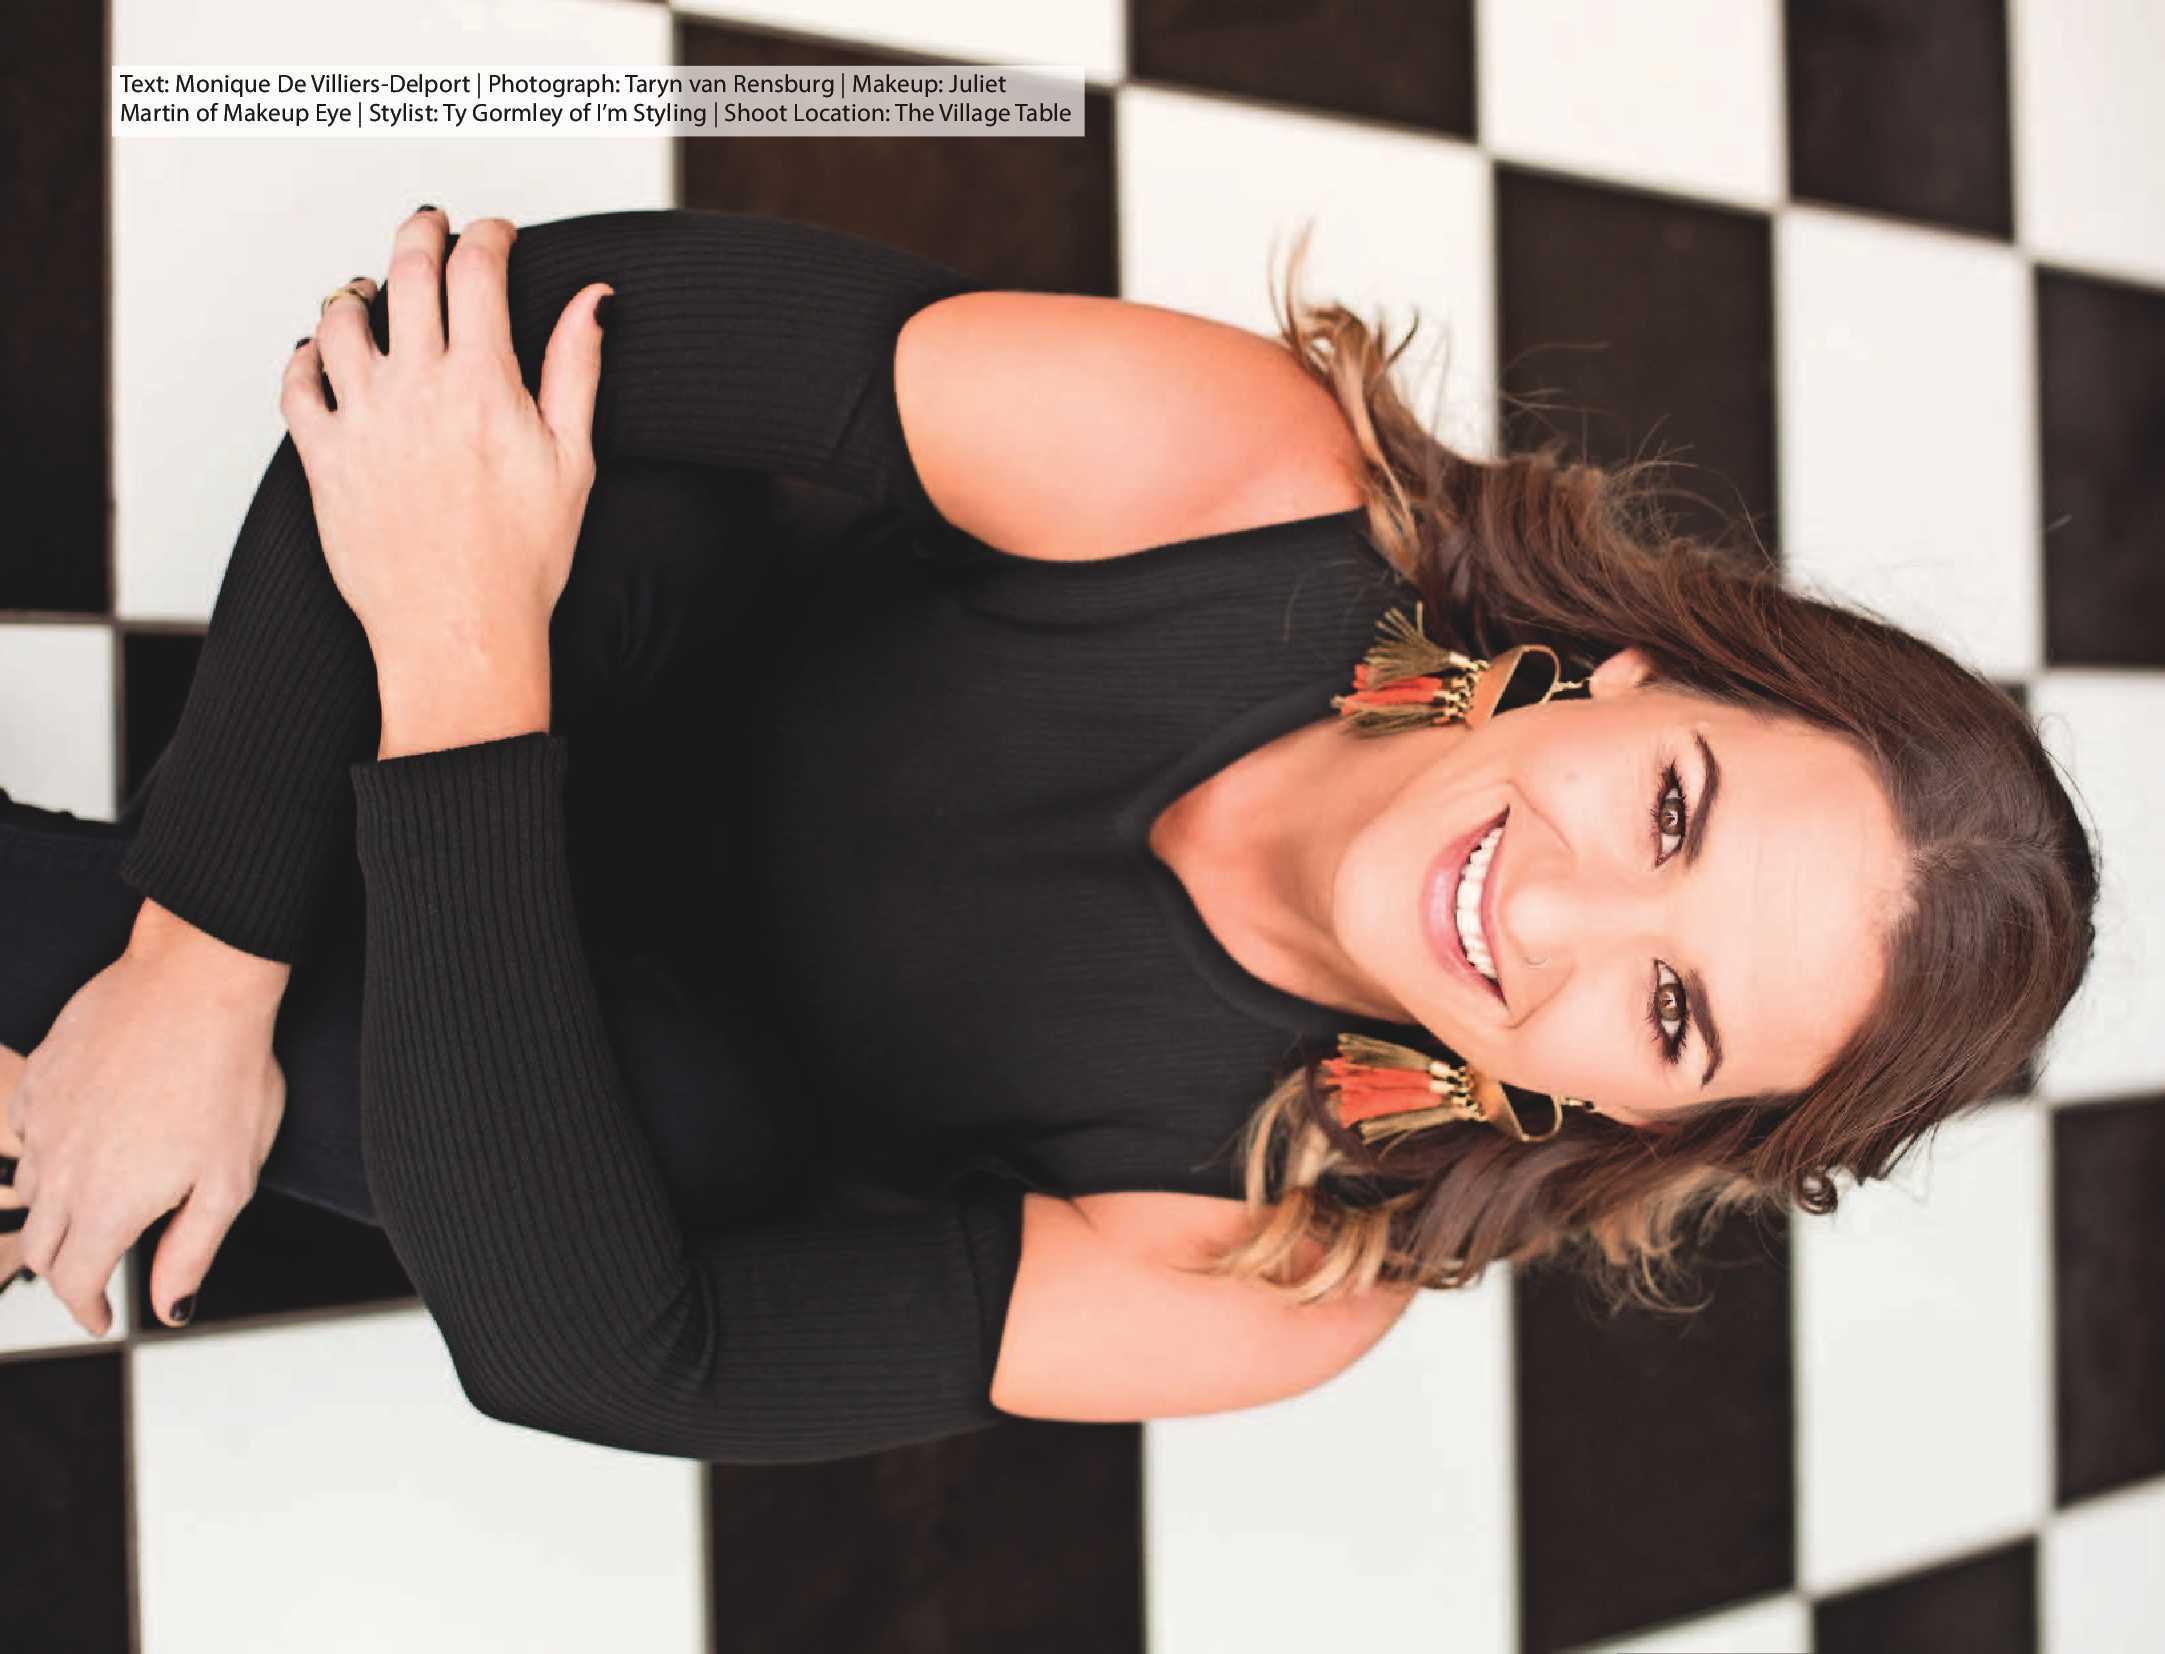 get-magazine-ballitoumhlanga-august-2017-epapers-page-16